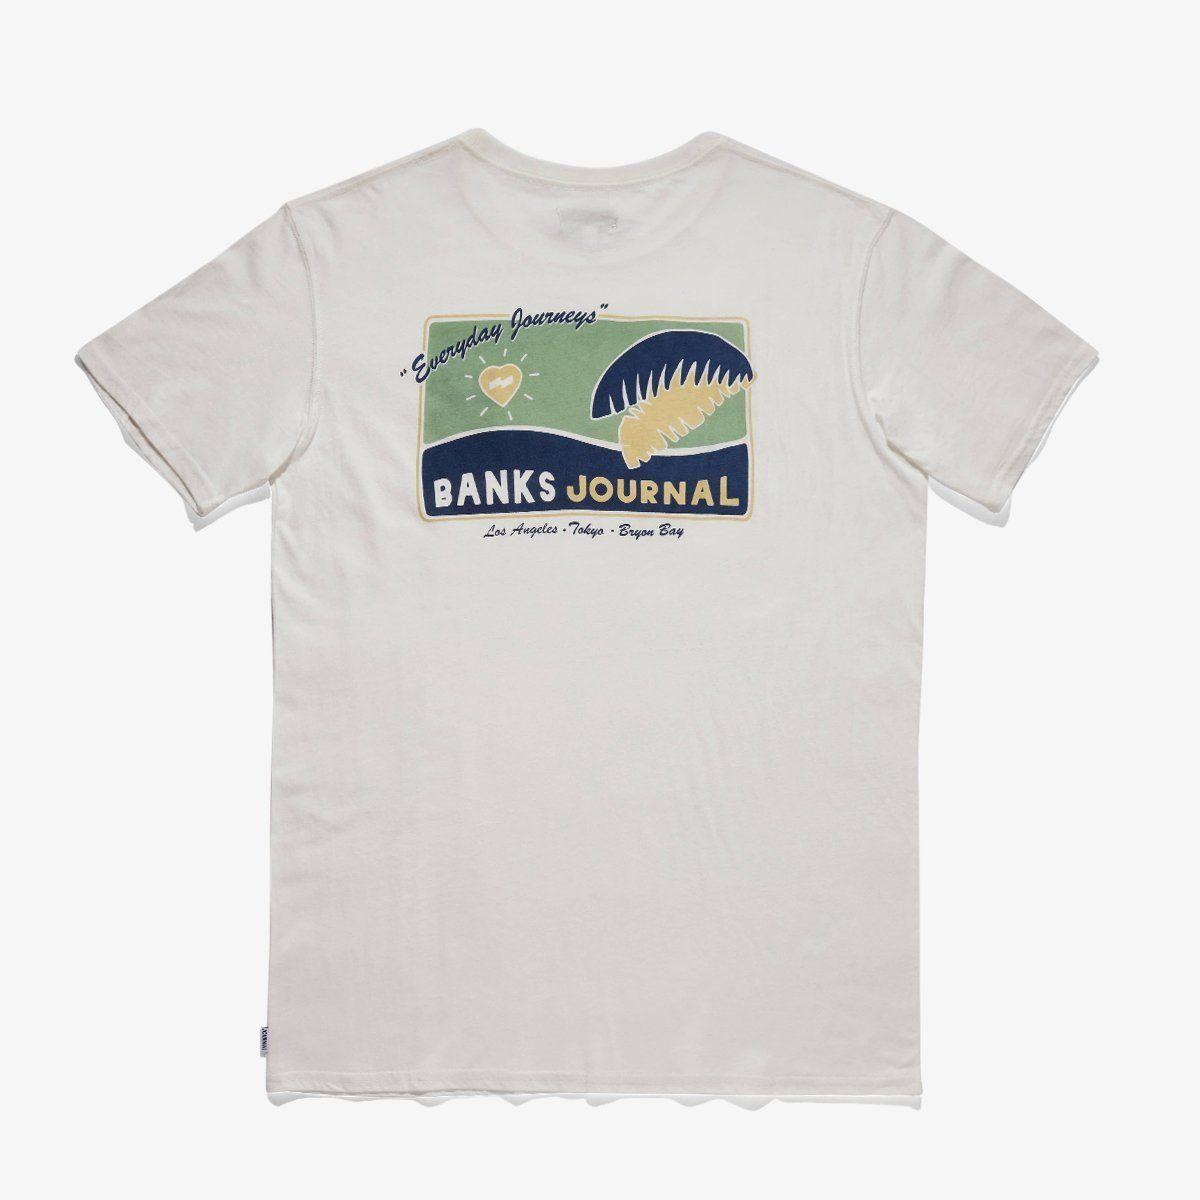 Goodvibes Tee Shirt - Banks Journal